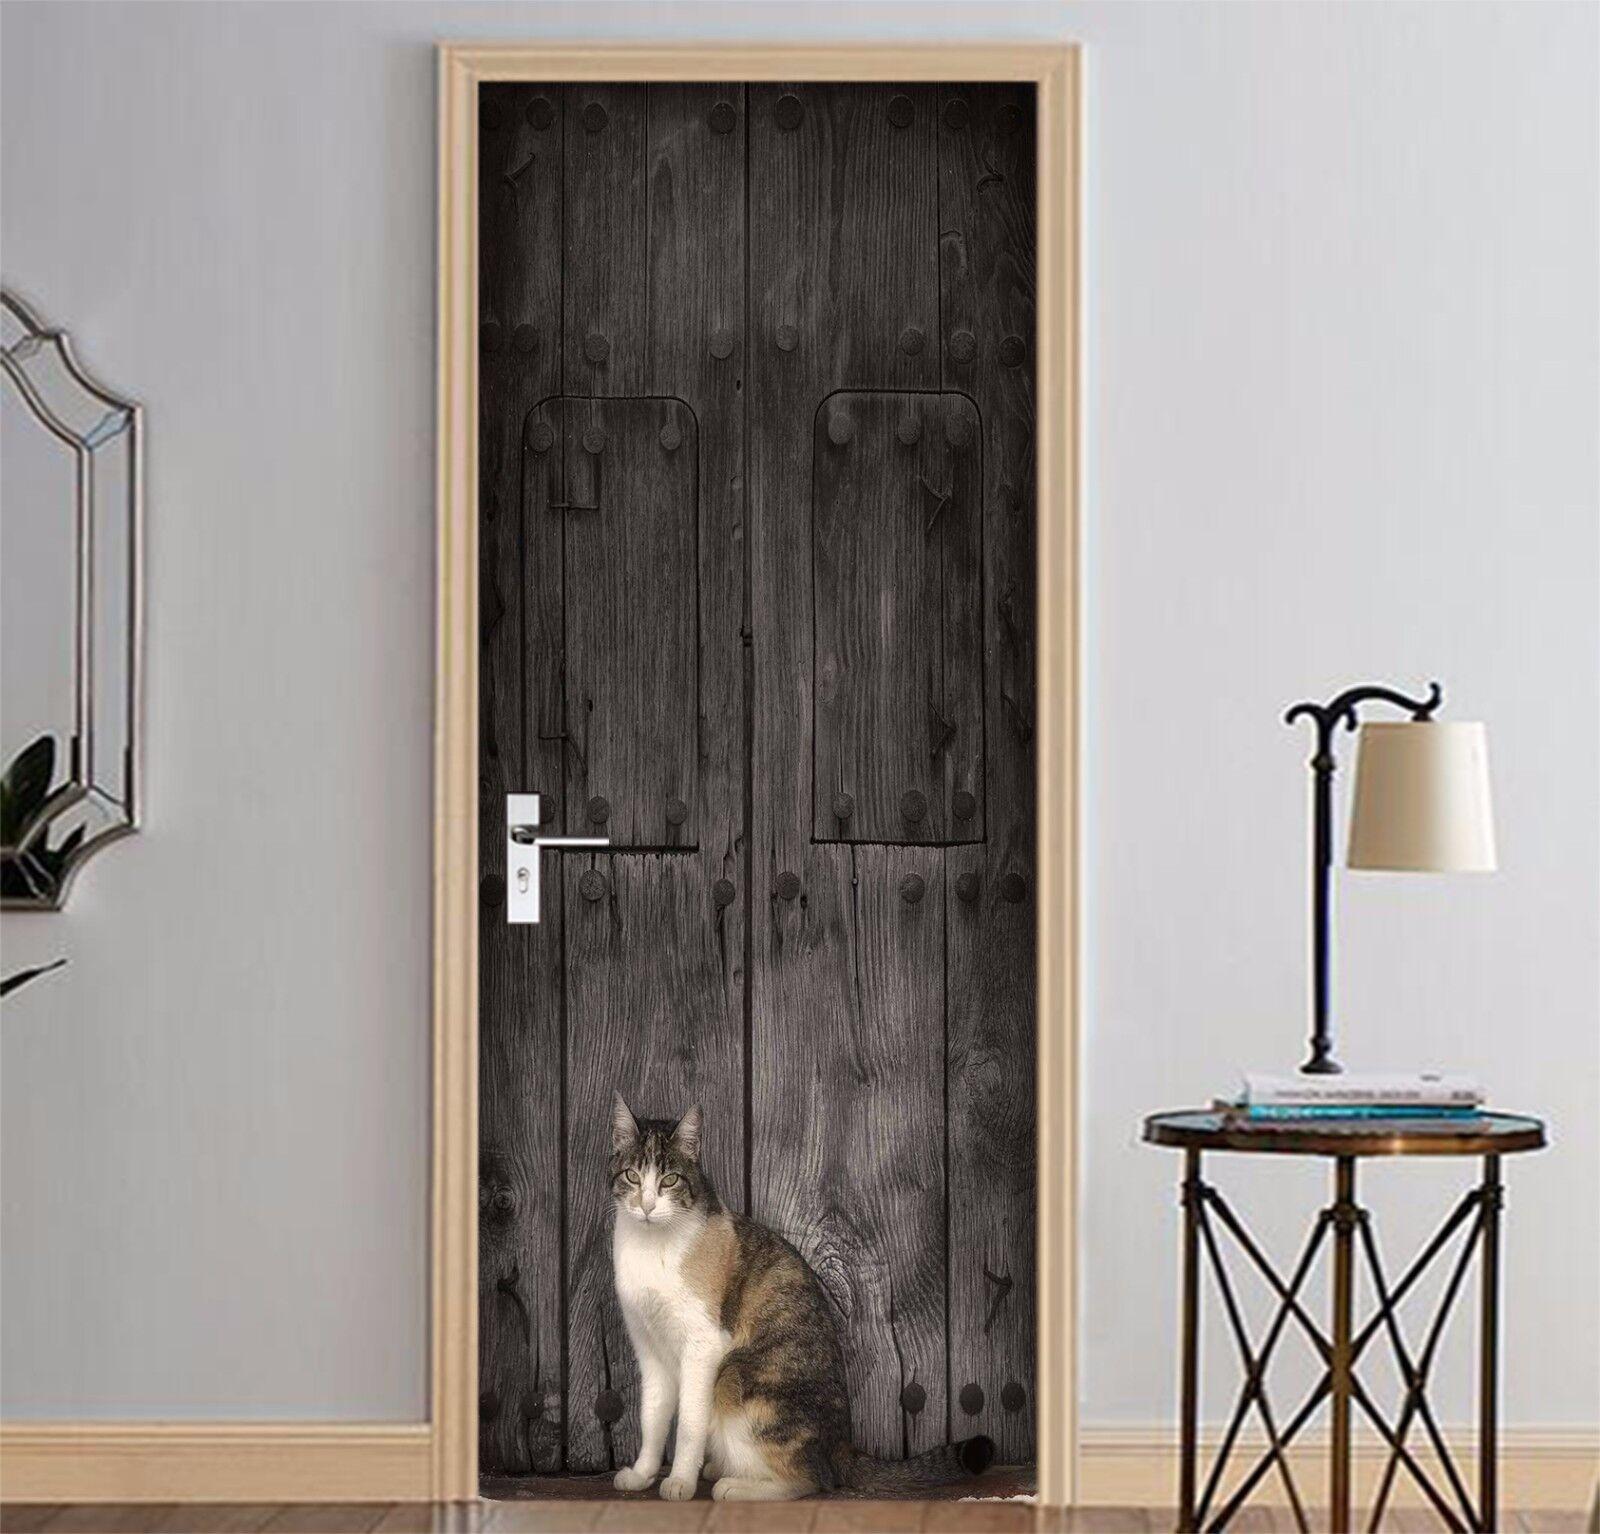 3D Katze Tier Tür Wandmalerei Wandaufkleber Aufkleber AJ WALLPAPER DE Kyra  | Helle Farben  | Online Kaufen  | Neues Design